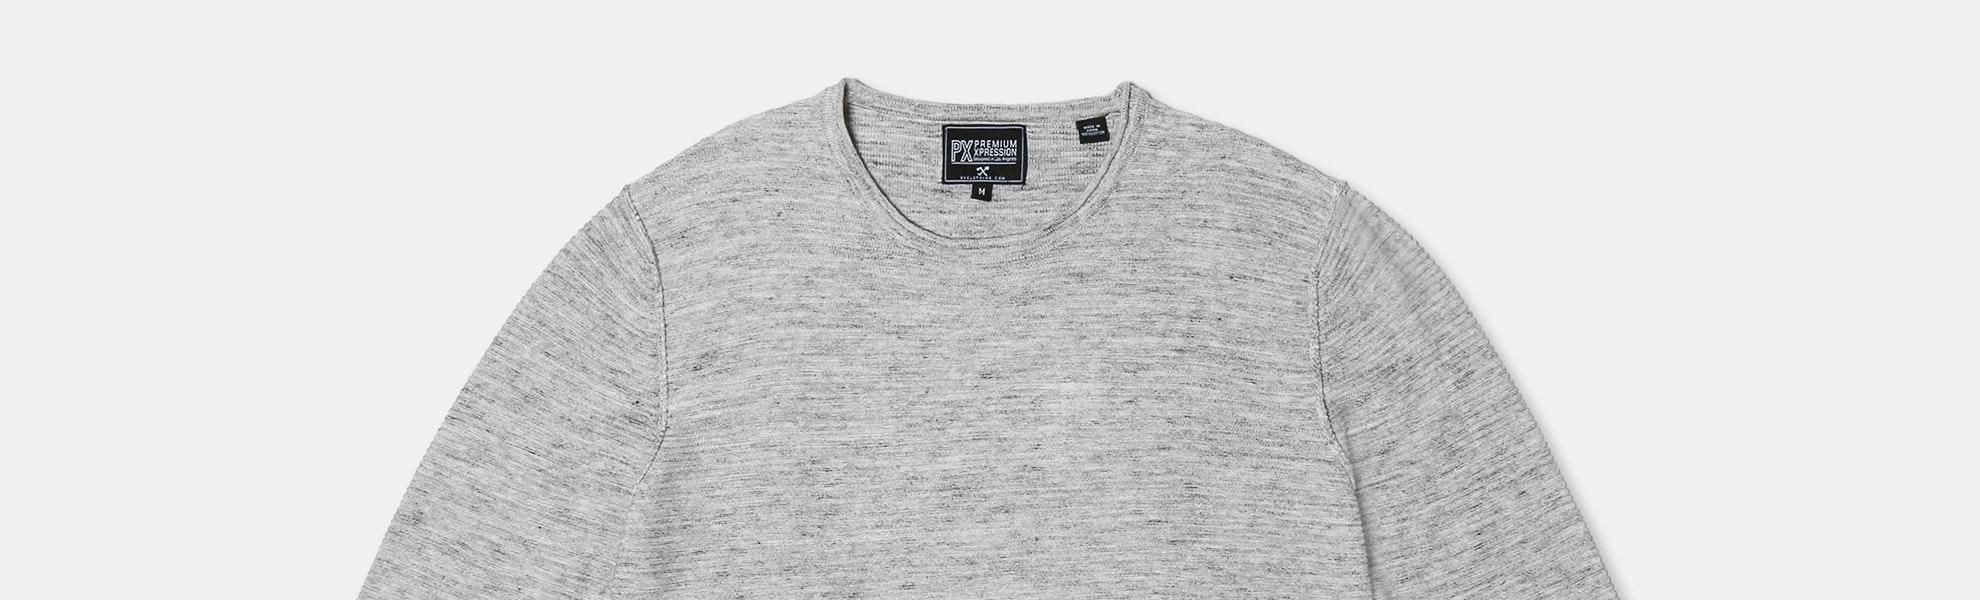 PX Clothing Lightweight Asa Sweater